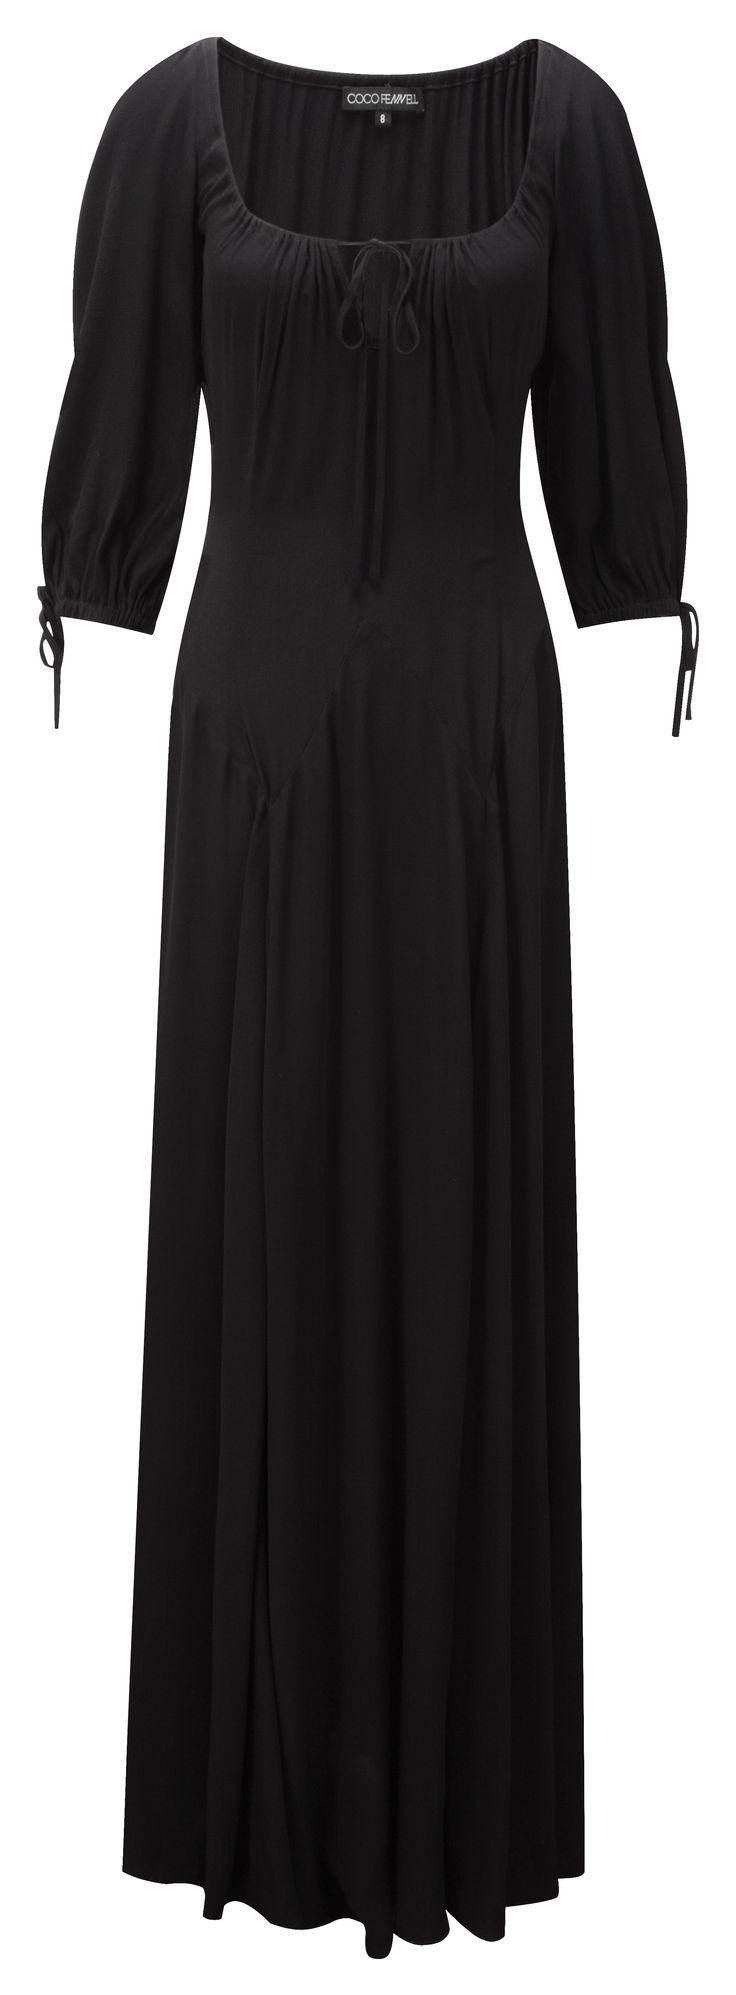 Black n white maxi dress 3t